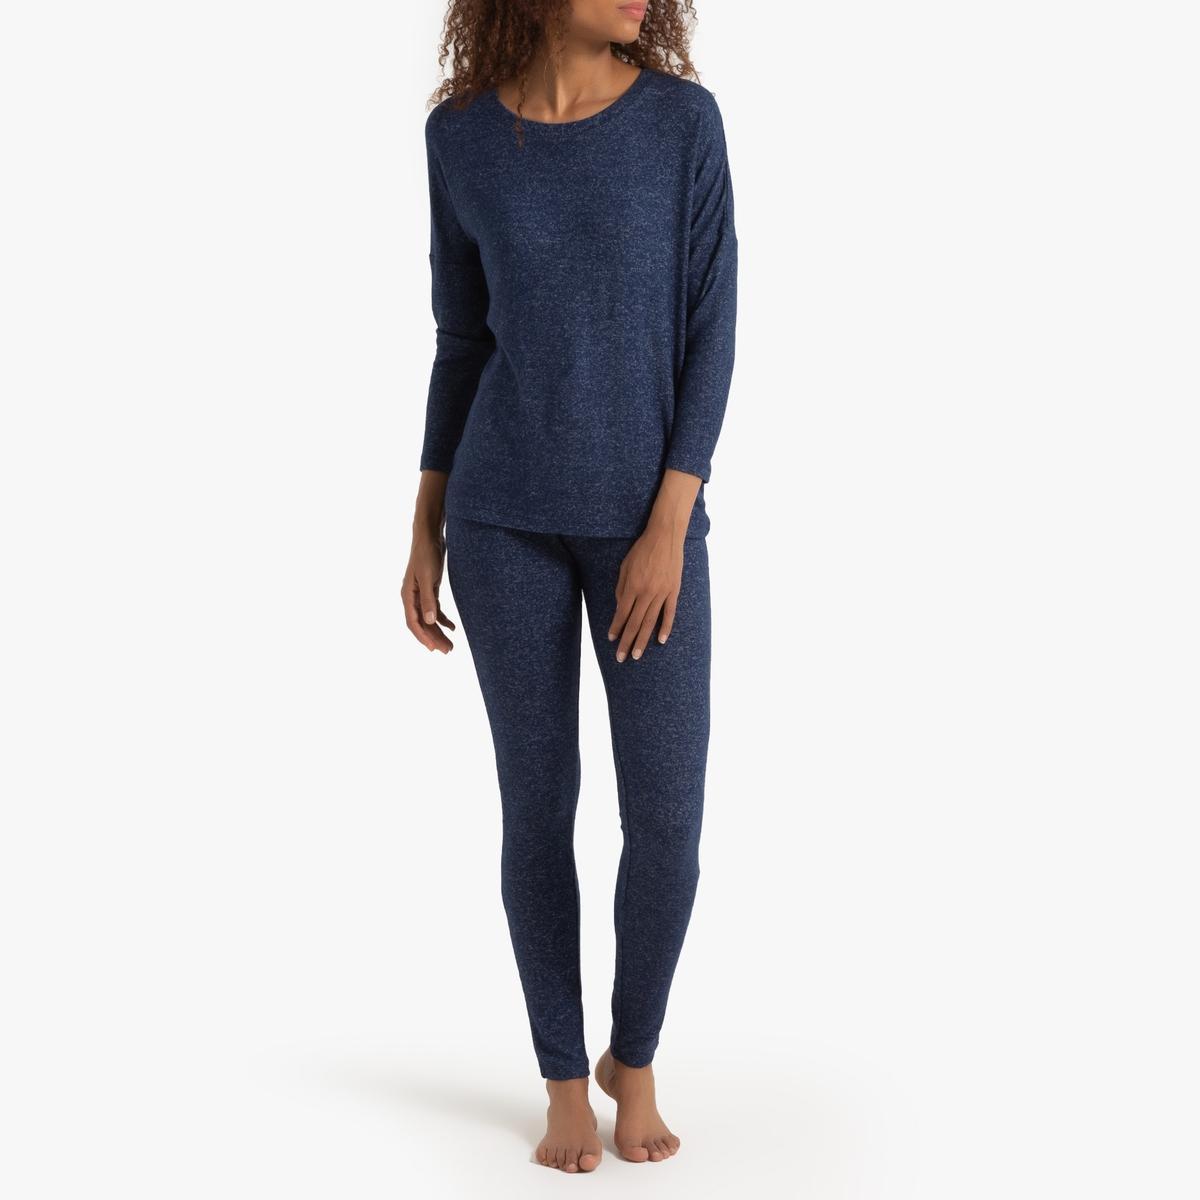 Пижама La Redoute Экстра-мягкая 34/36 (FR) - 40/42 (RUS) синий